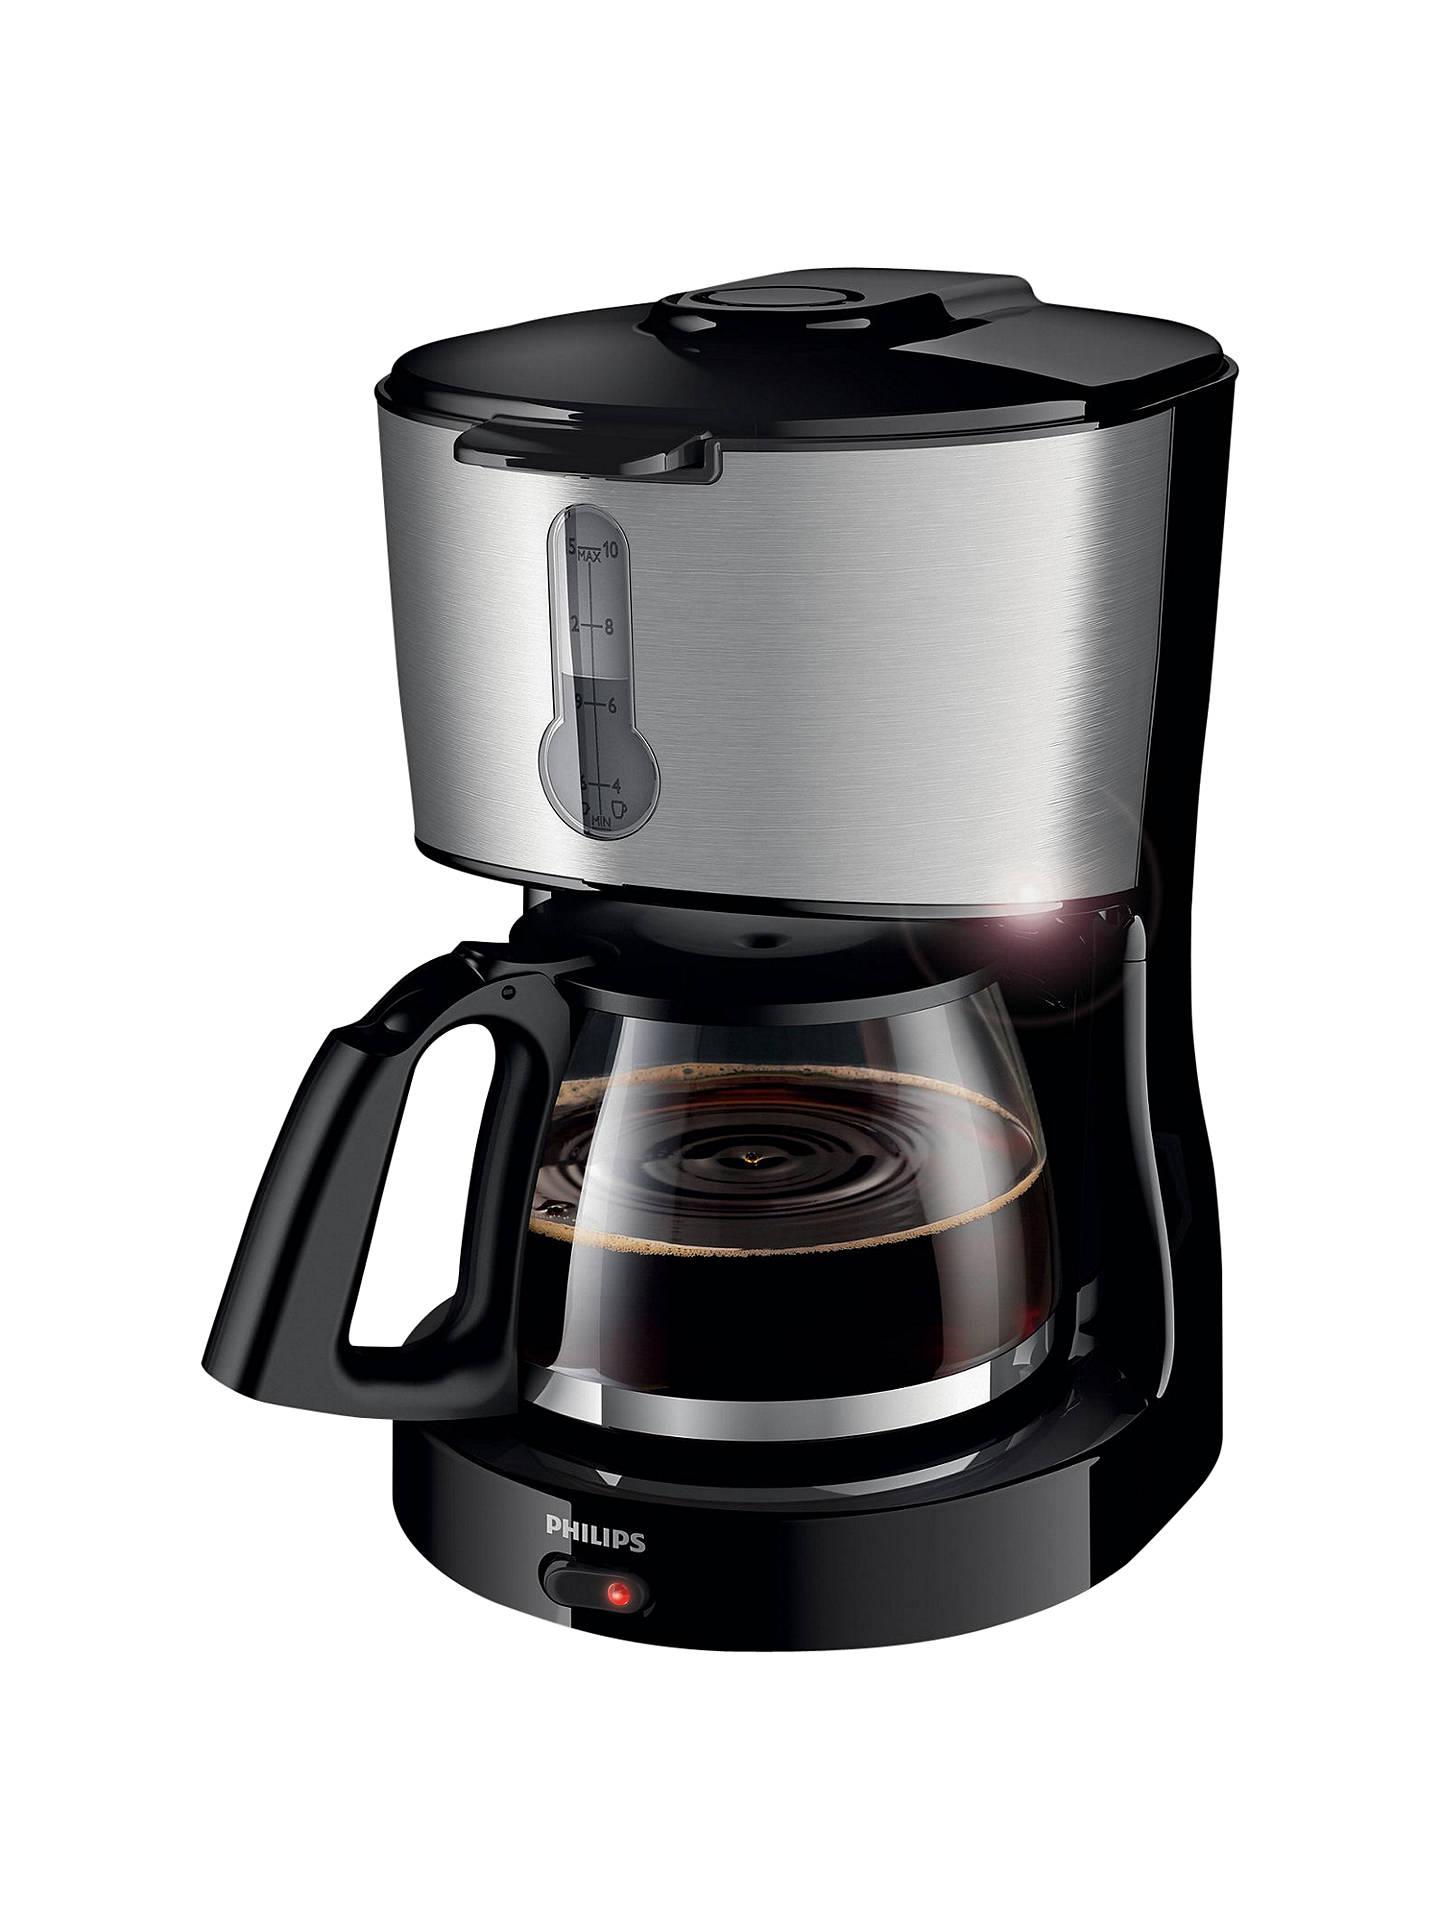 Philips Hd745800 Phoenix Filter Coffee Machine Black At